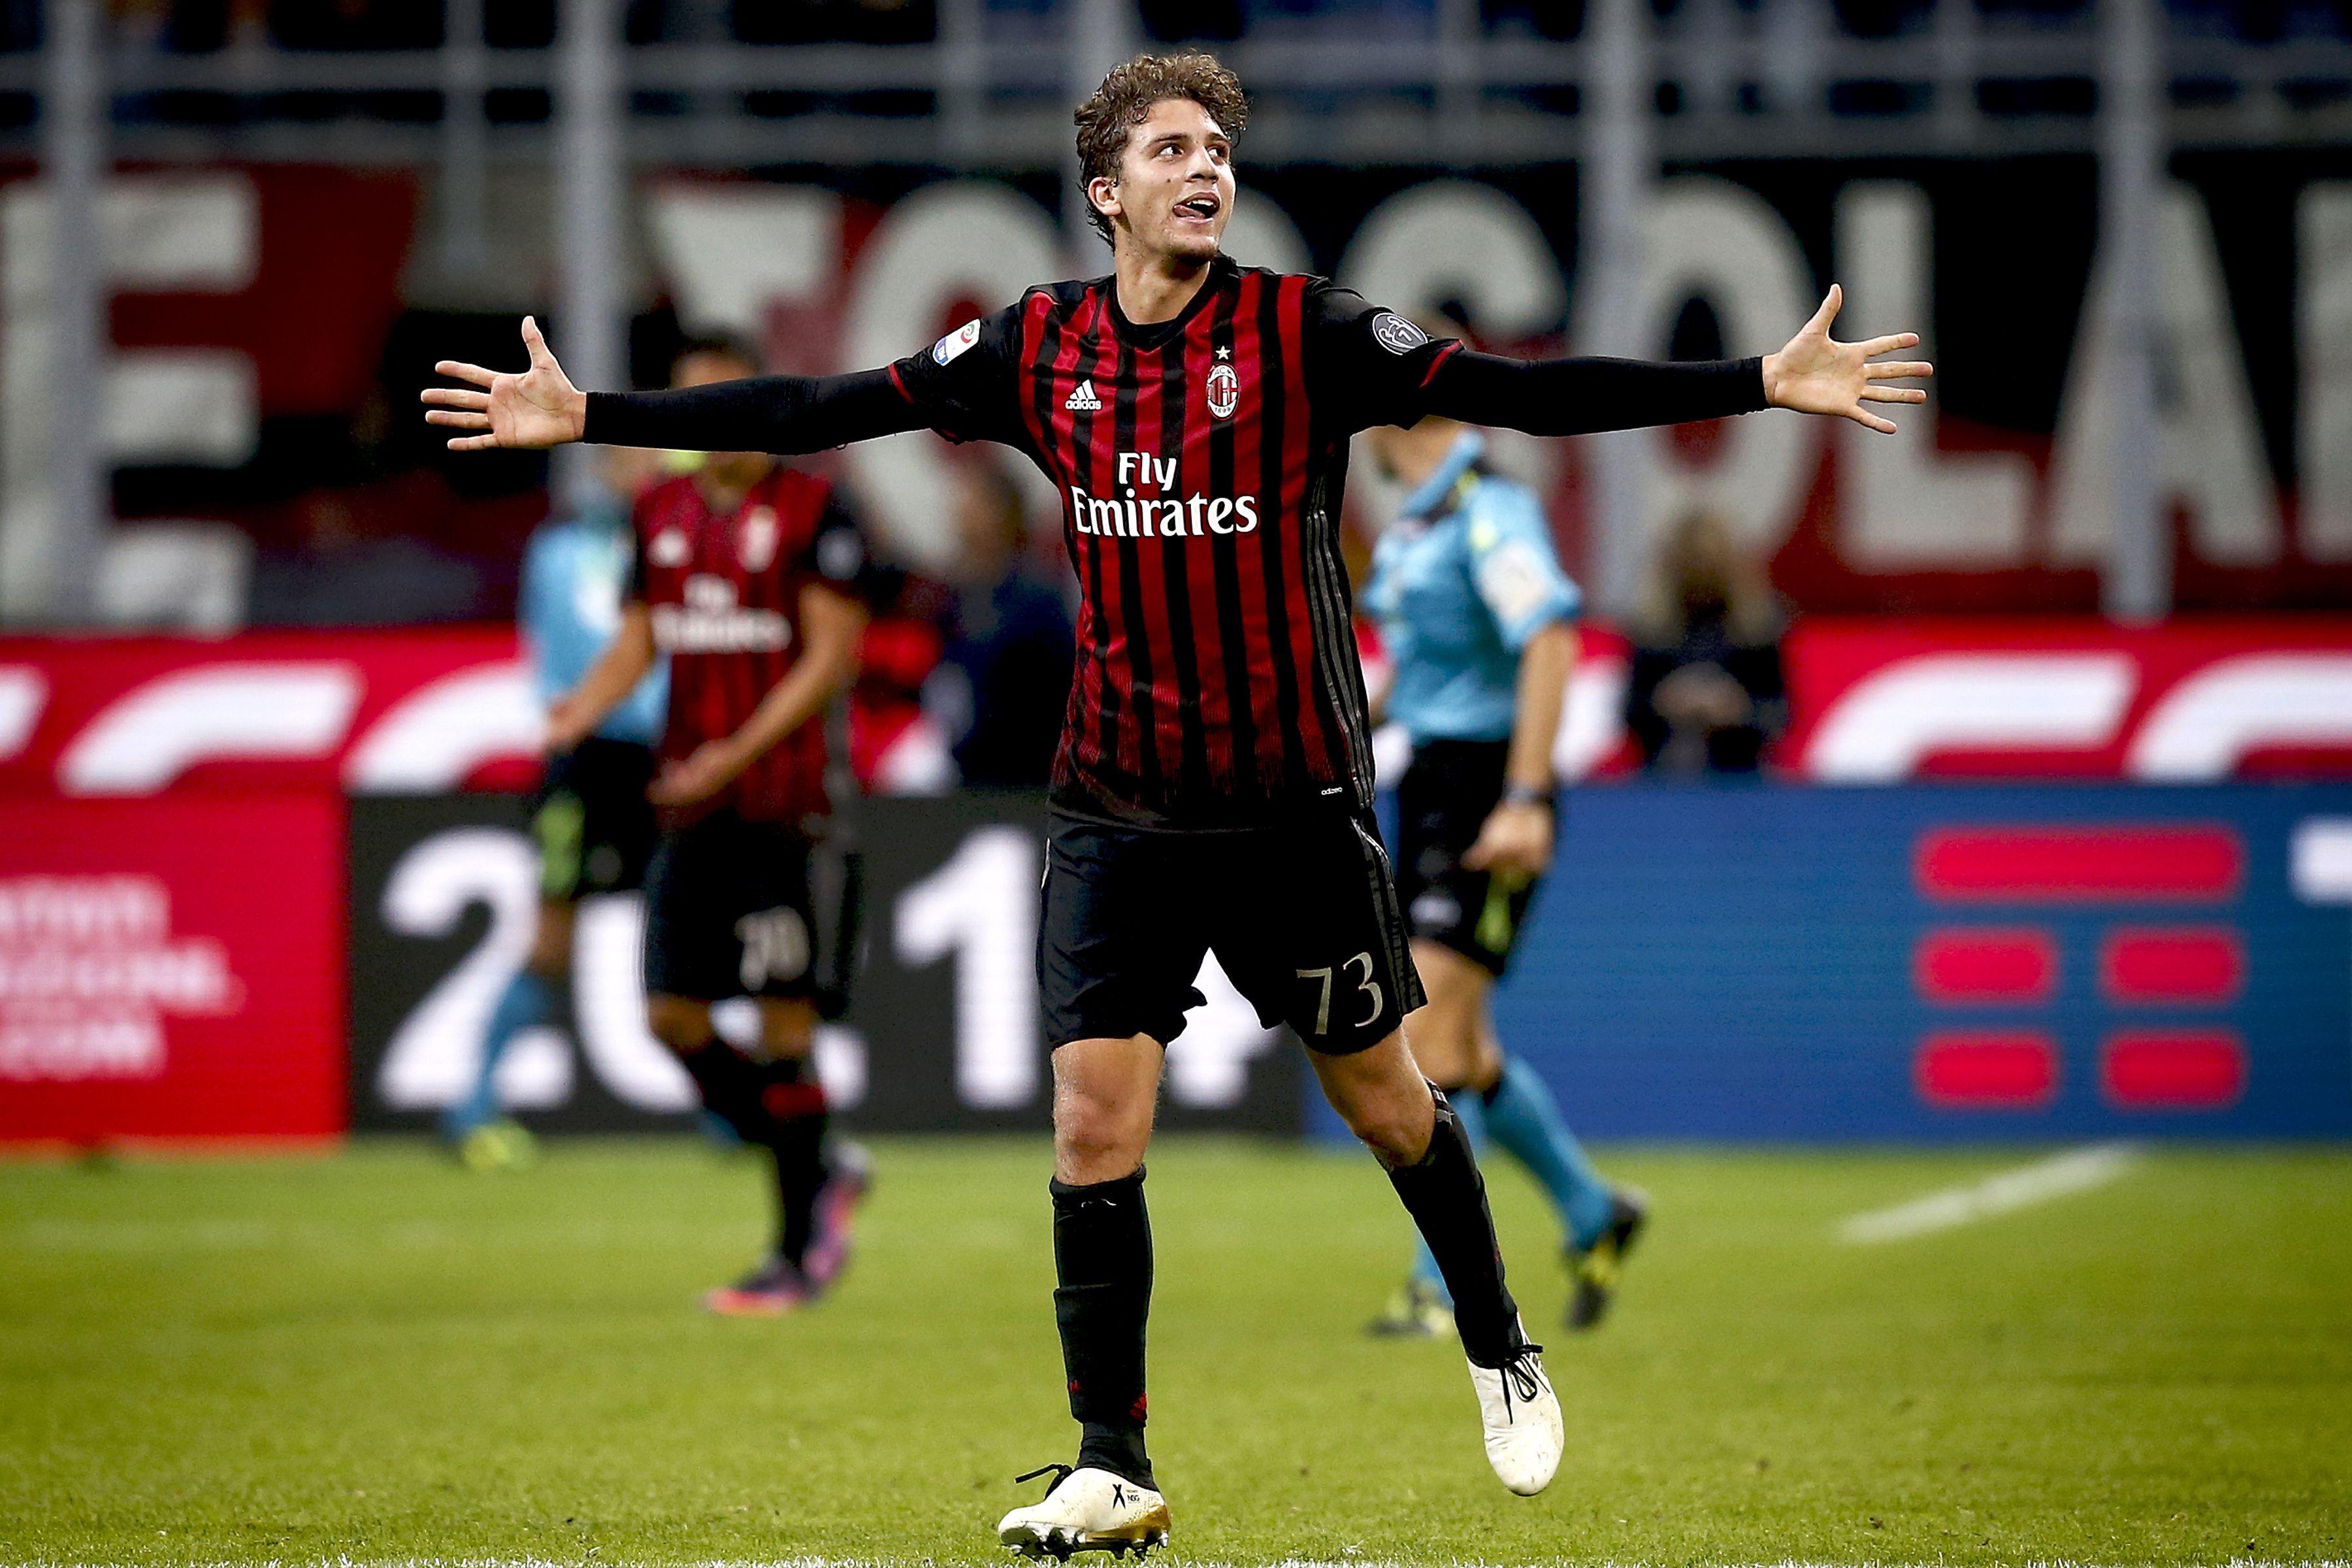 'I scored against the best goalkeeper in the world!' – how it feels to net a winner past Gianluigi Buffon